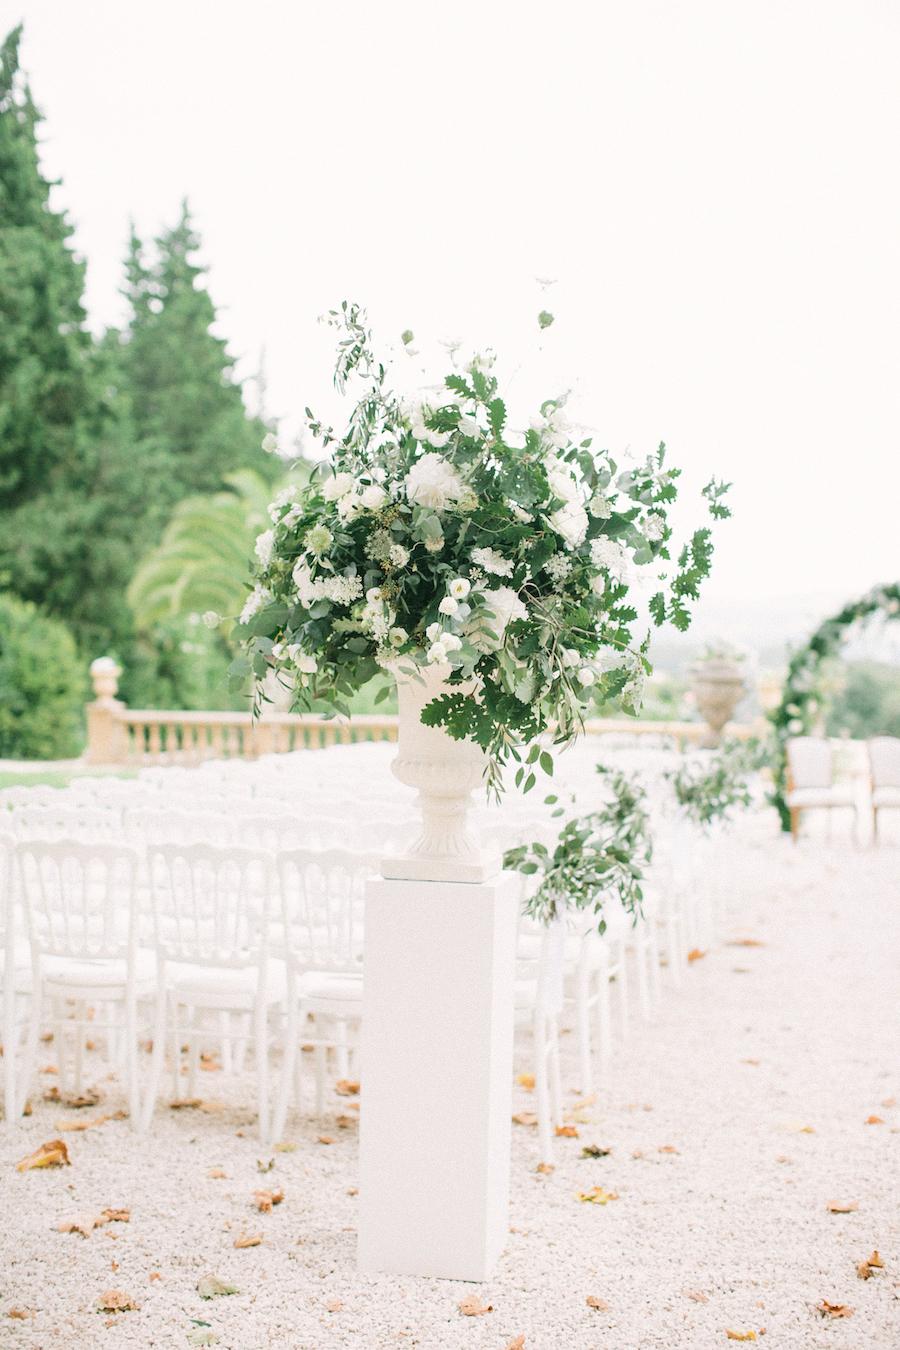 saya-photography-wedding-photographer-provence-chateau-de-robernier-32.jpg